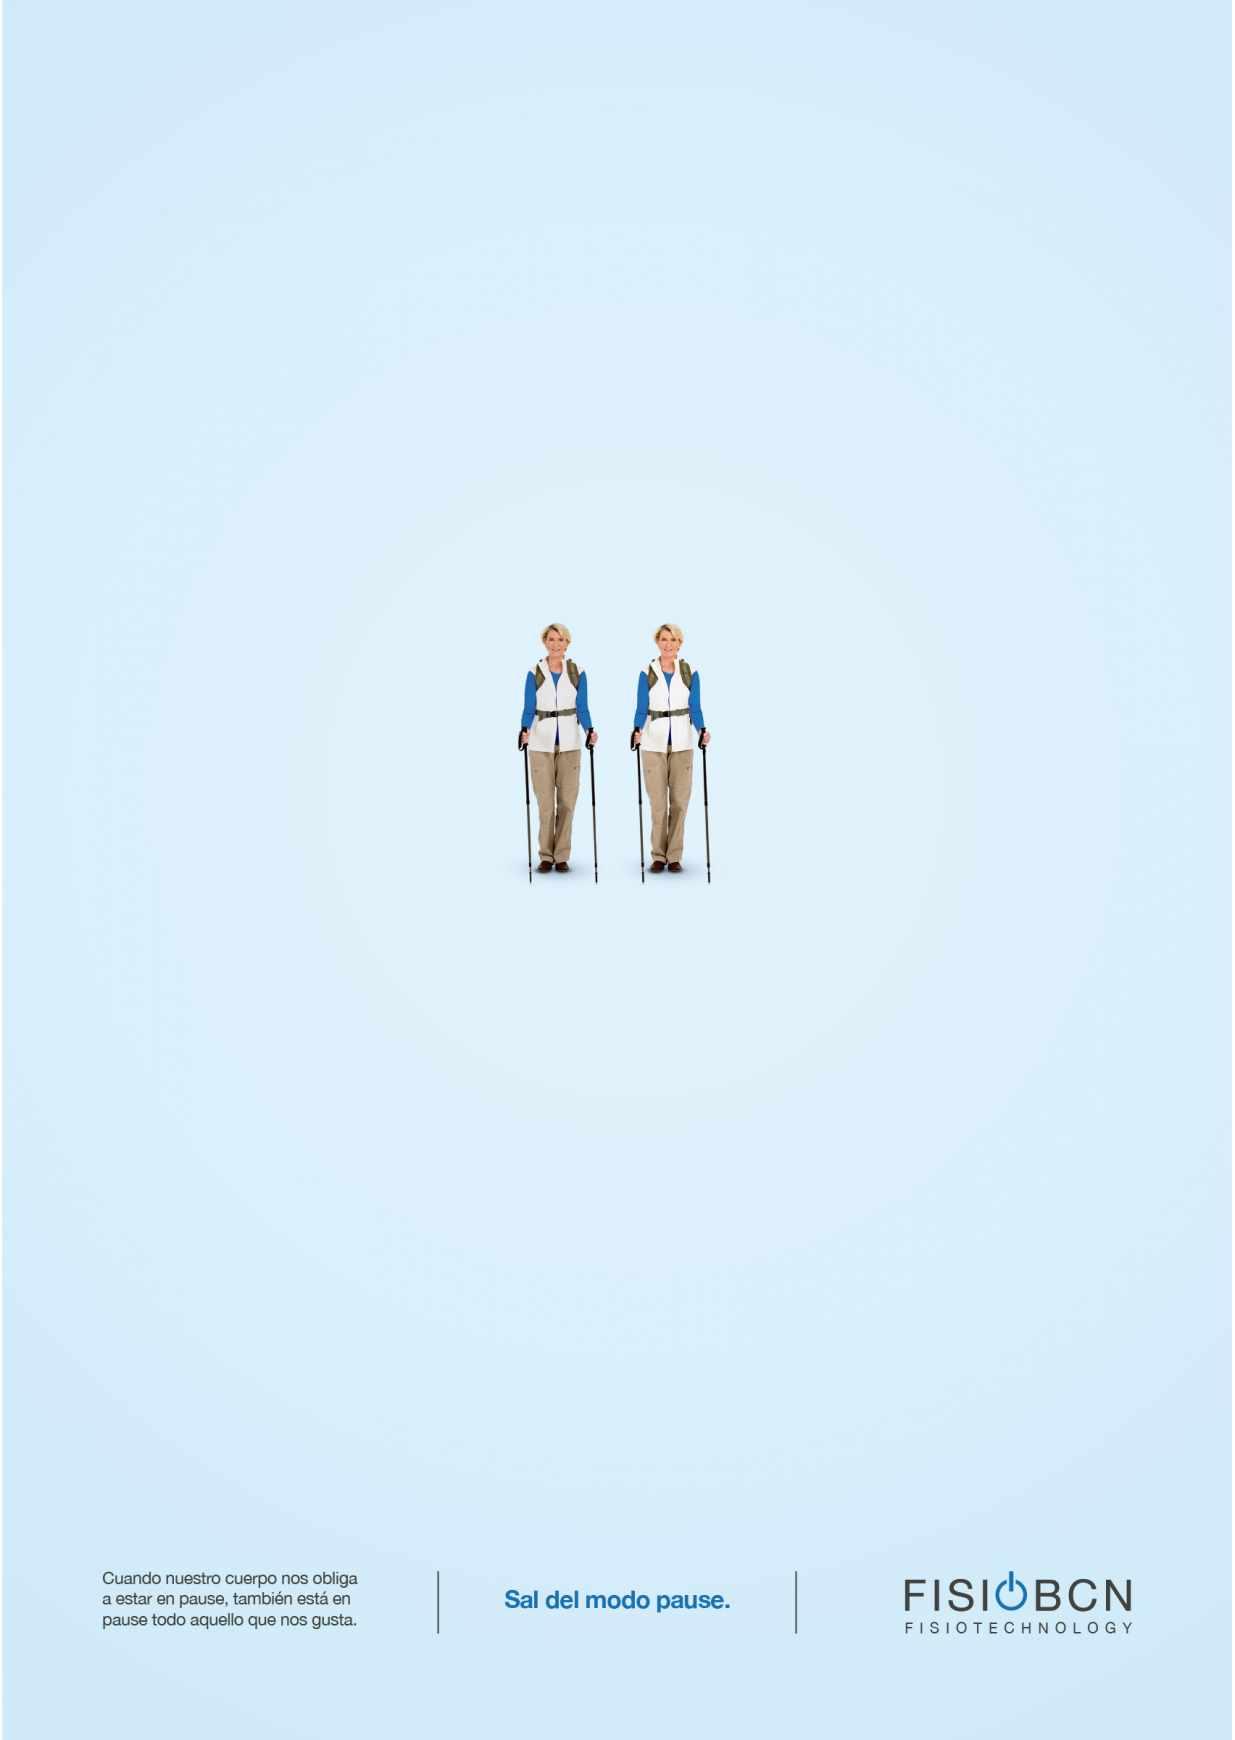 Fisio BCN Print Ad - Pause - Trekking